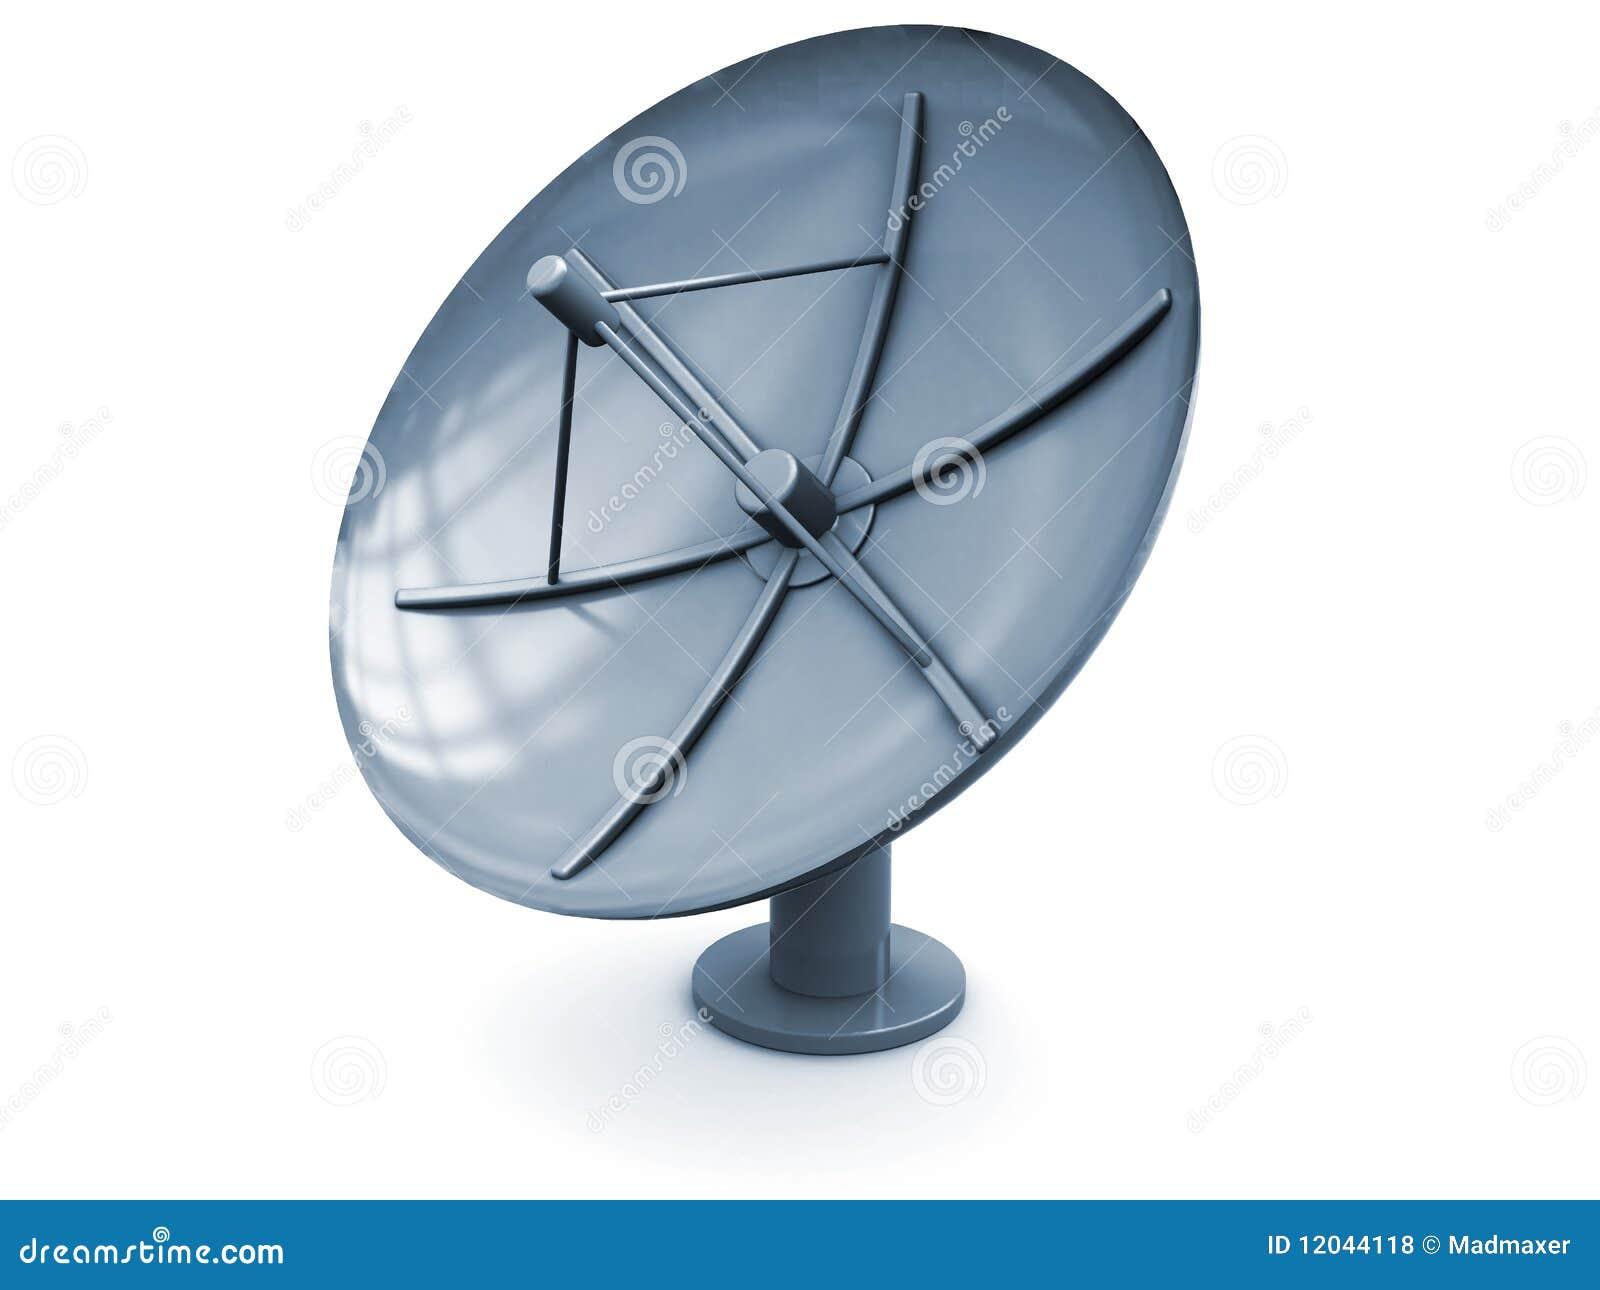 Satellite Antenna Royalty Free Stock Photos - Image: 12044118